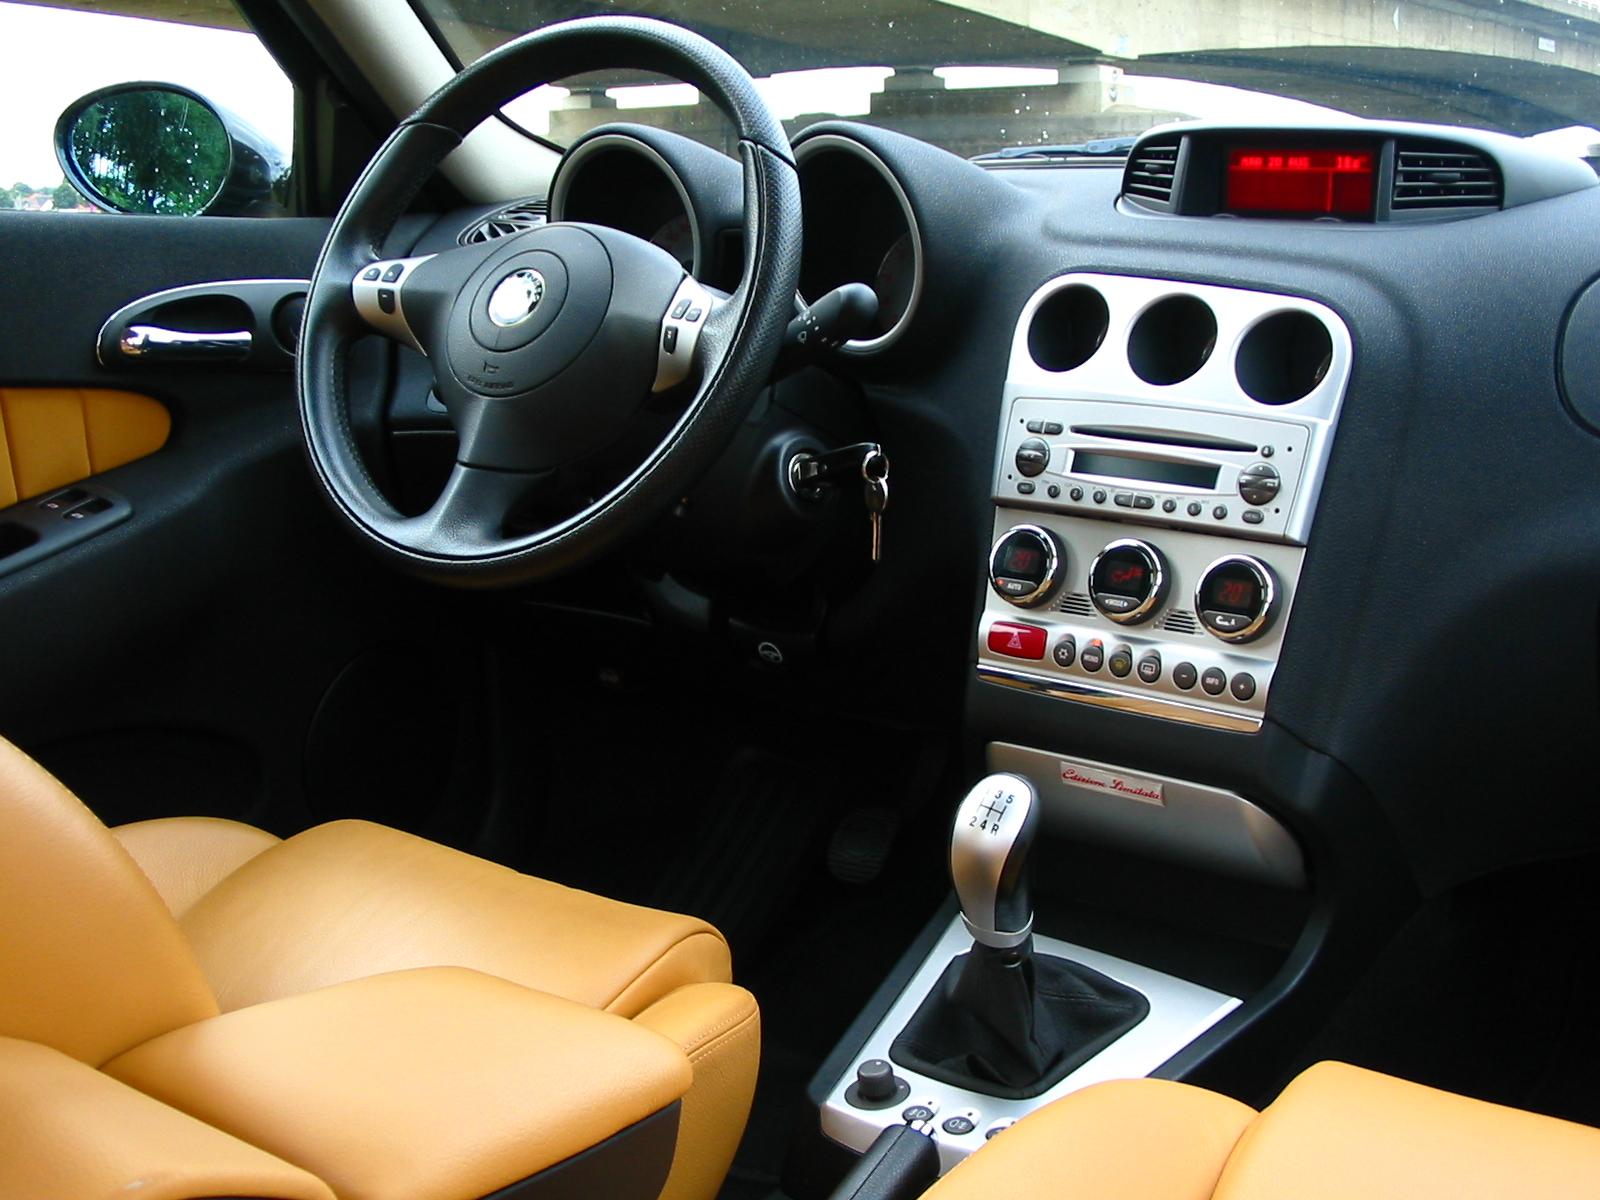 Alfa Romeo 156 I Restyling 2 2003 - 2007 Station wagon 5 door #6